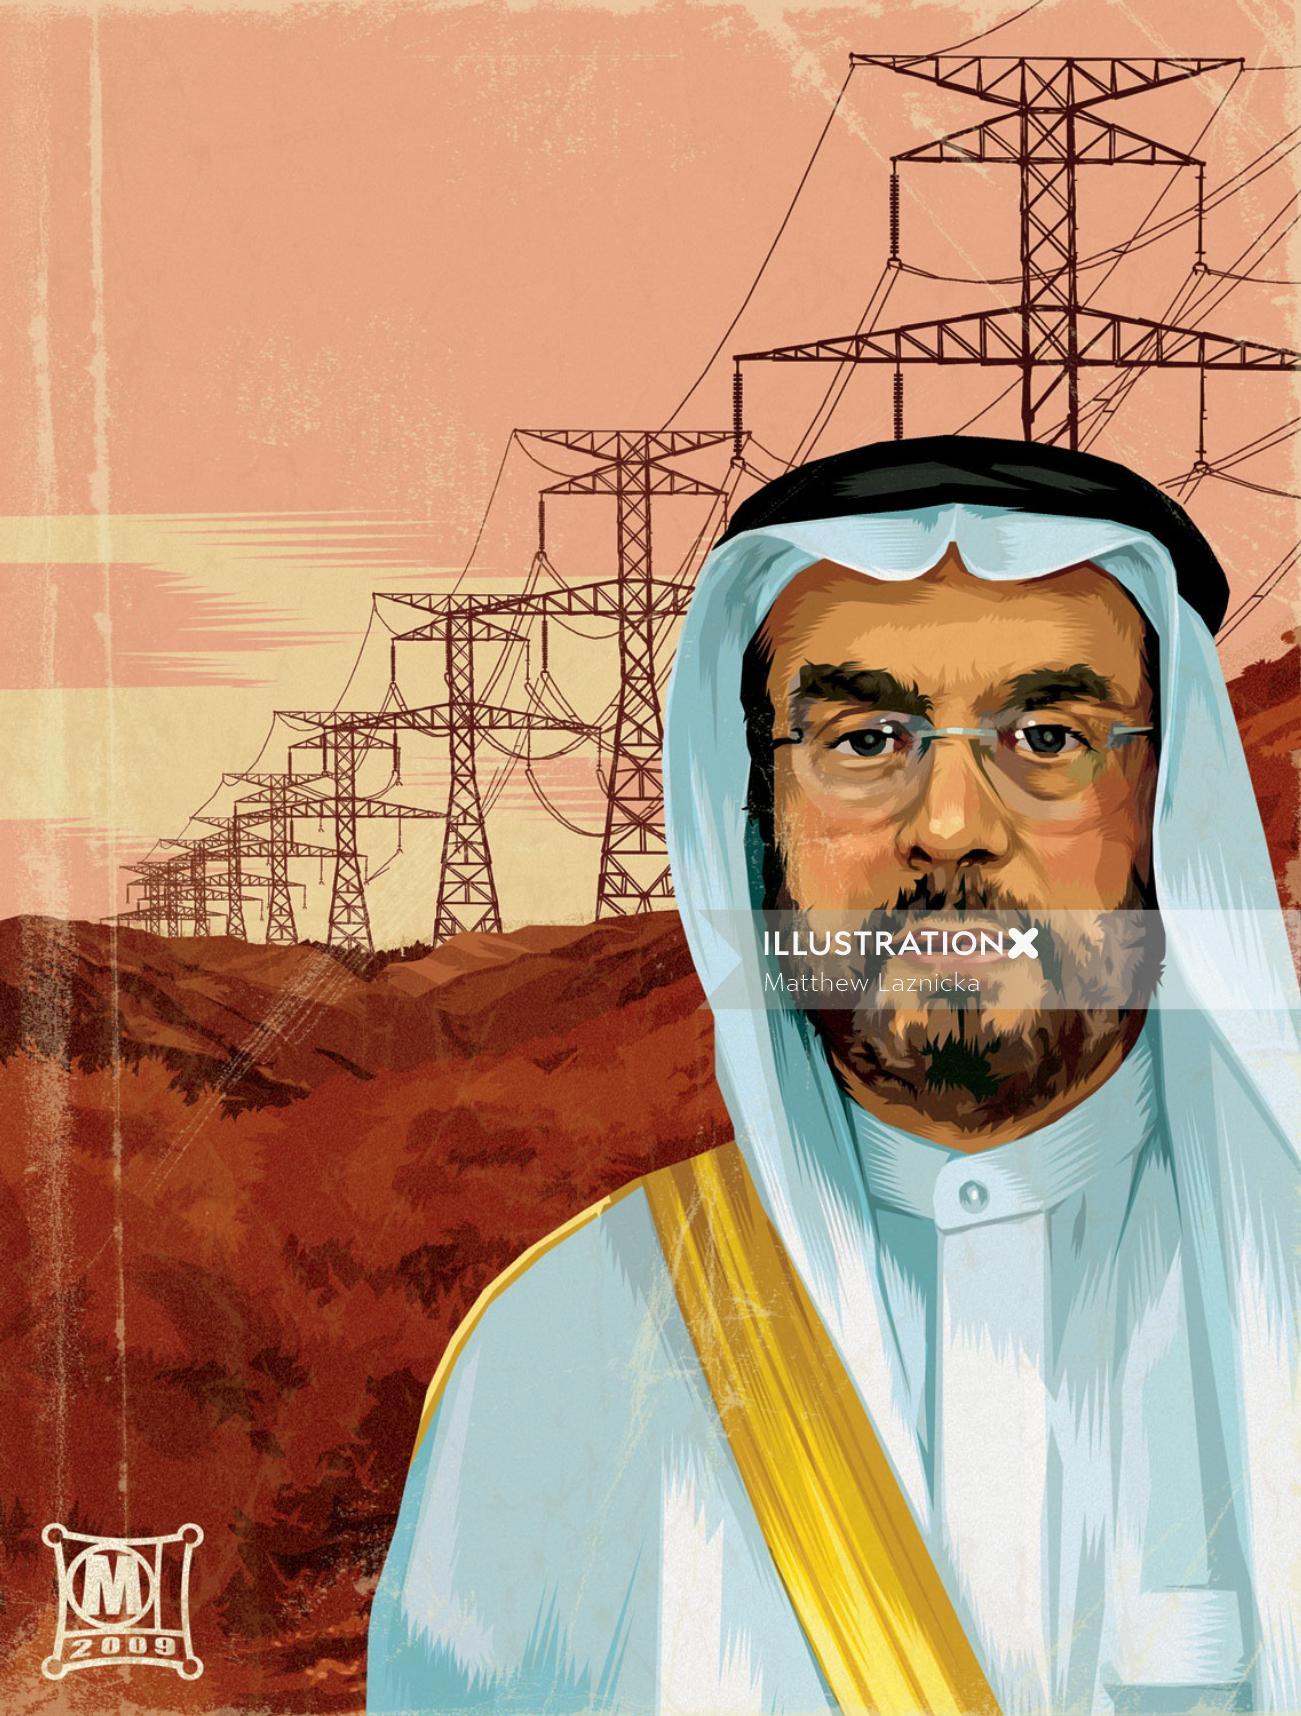 Portrait illustration of a Arabian man